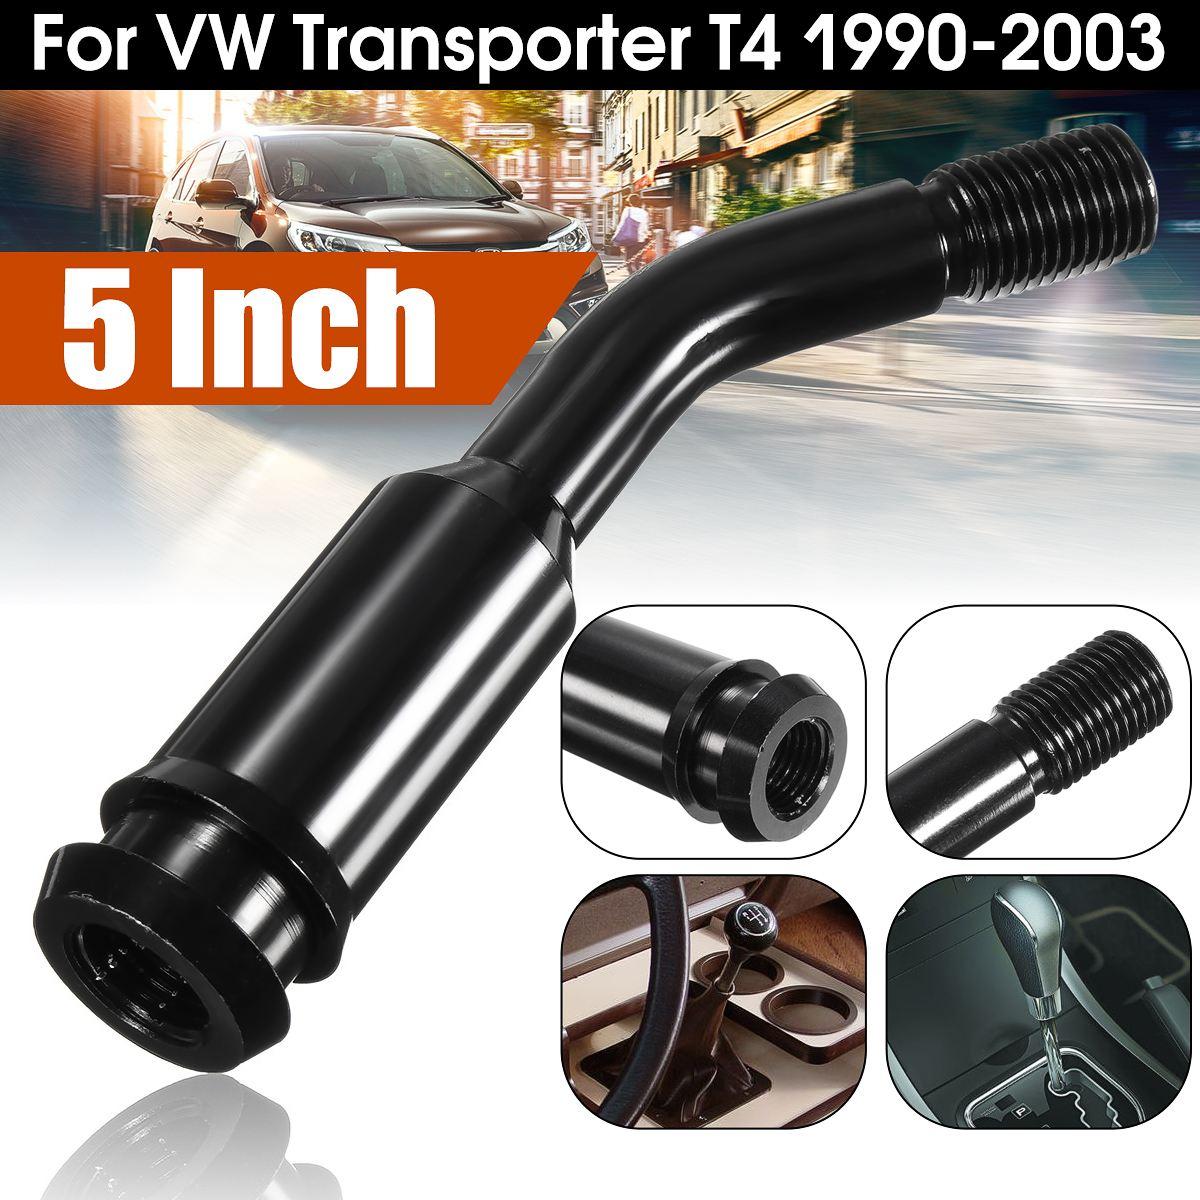 Palanca de cambios de coche negra de aluminio palanca de 5 pulgadas extensión curva para VW Transporter T4 1990-2003